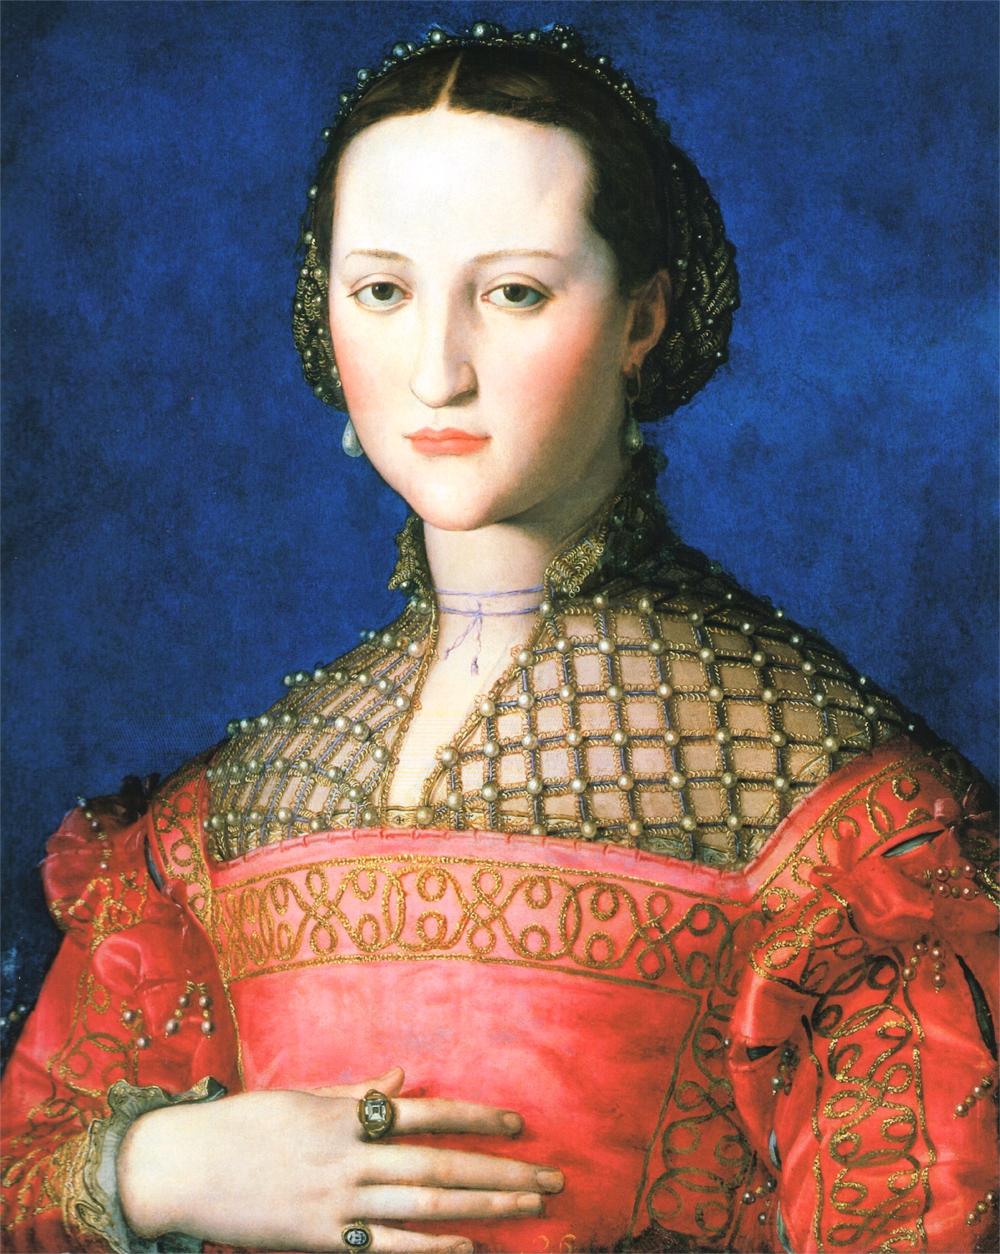 Eleonora_di_Toledo_1543_Agnolo_Bronzino.jpg